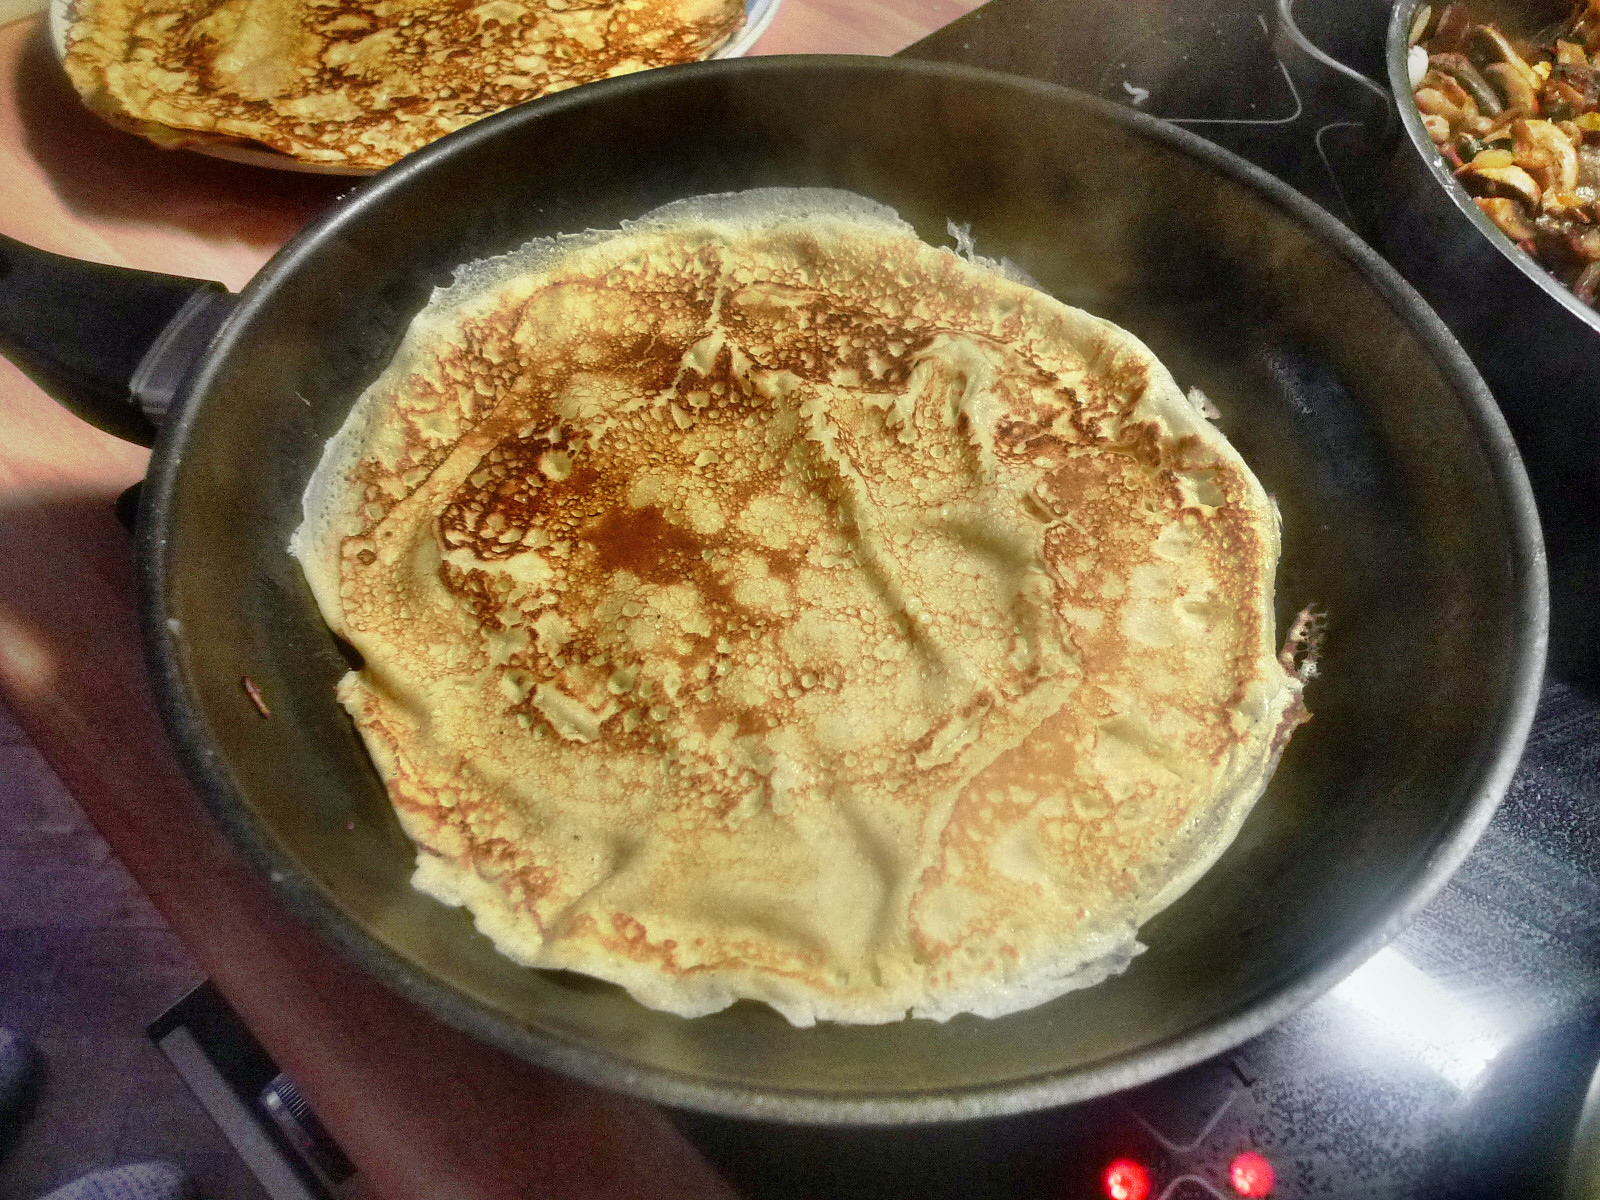 Crepe-Pilze-Salate-24.8.14   (12)